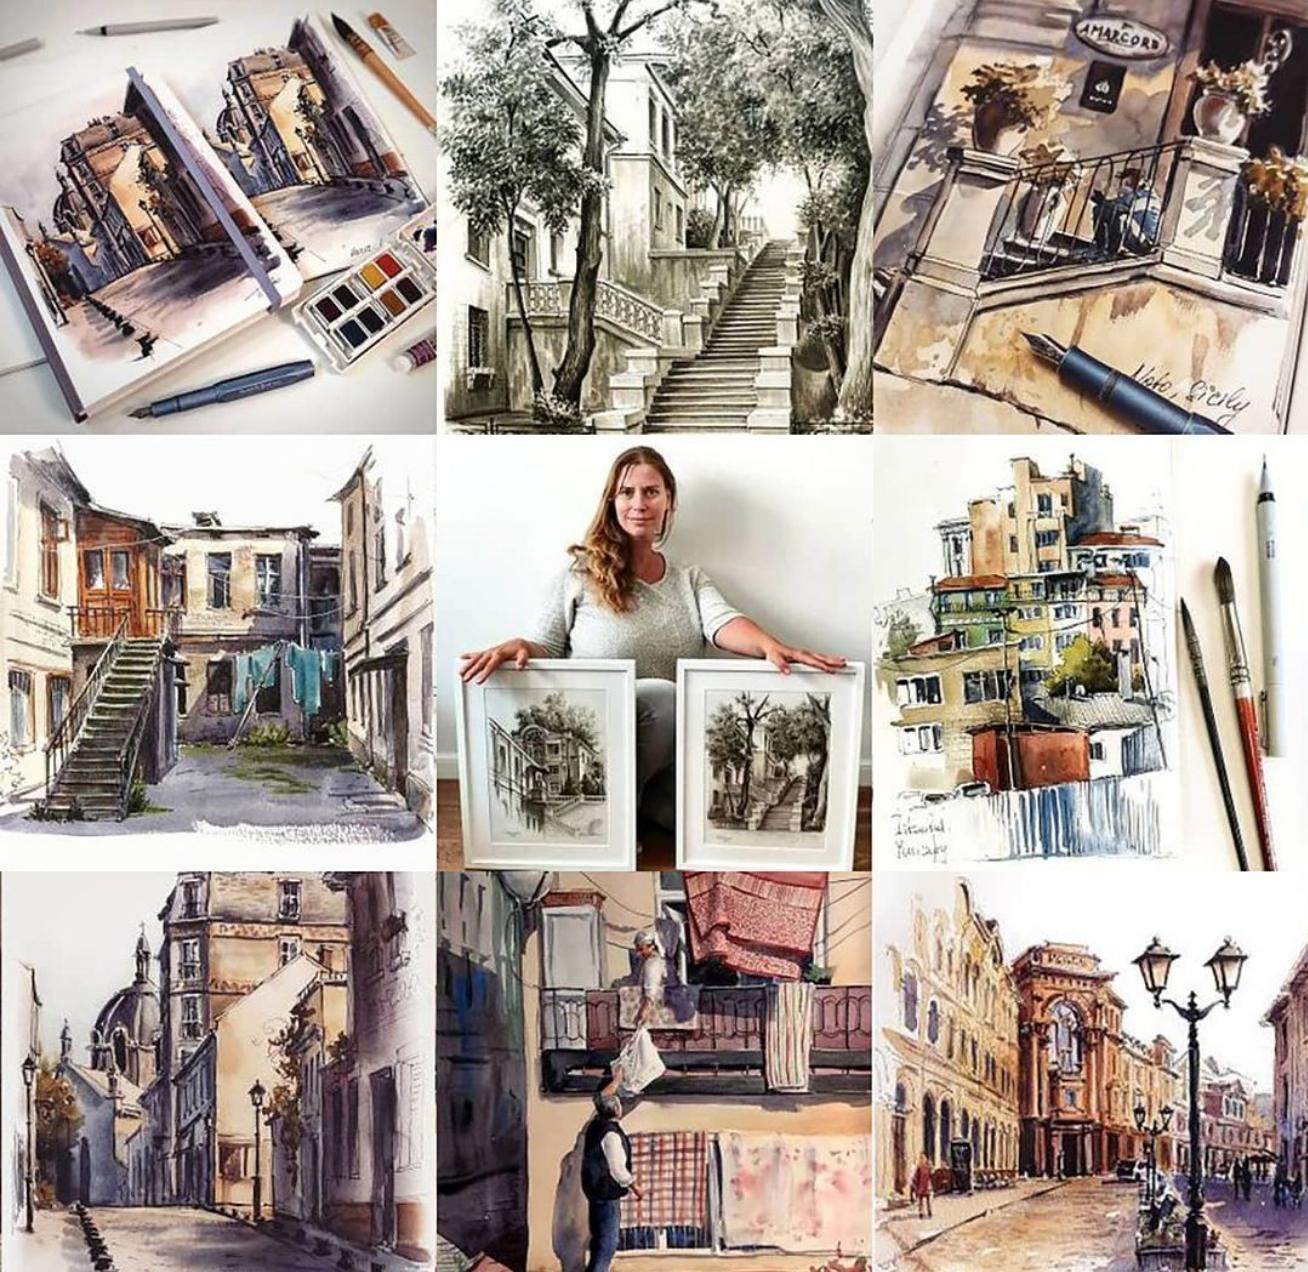 Tatiana-korotkevich-how-2020-impacted-art